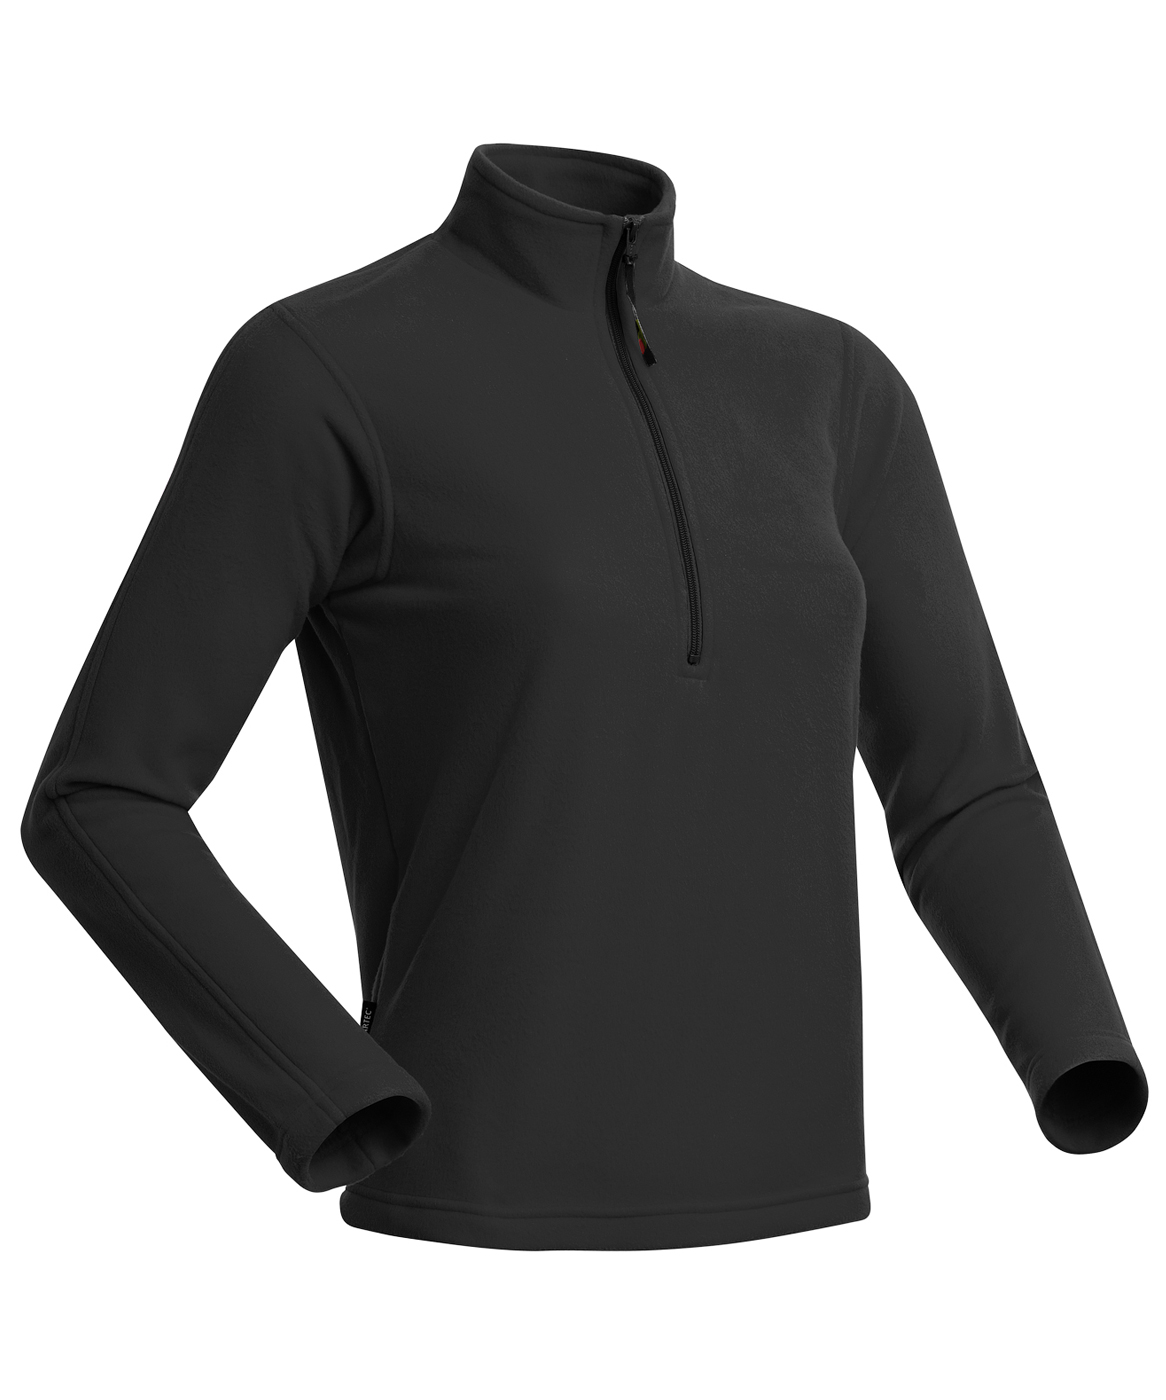 Куртка BASK POL SCORPIO LJ V2 1217B